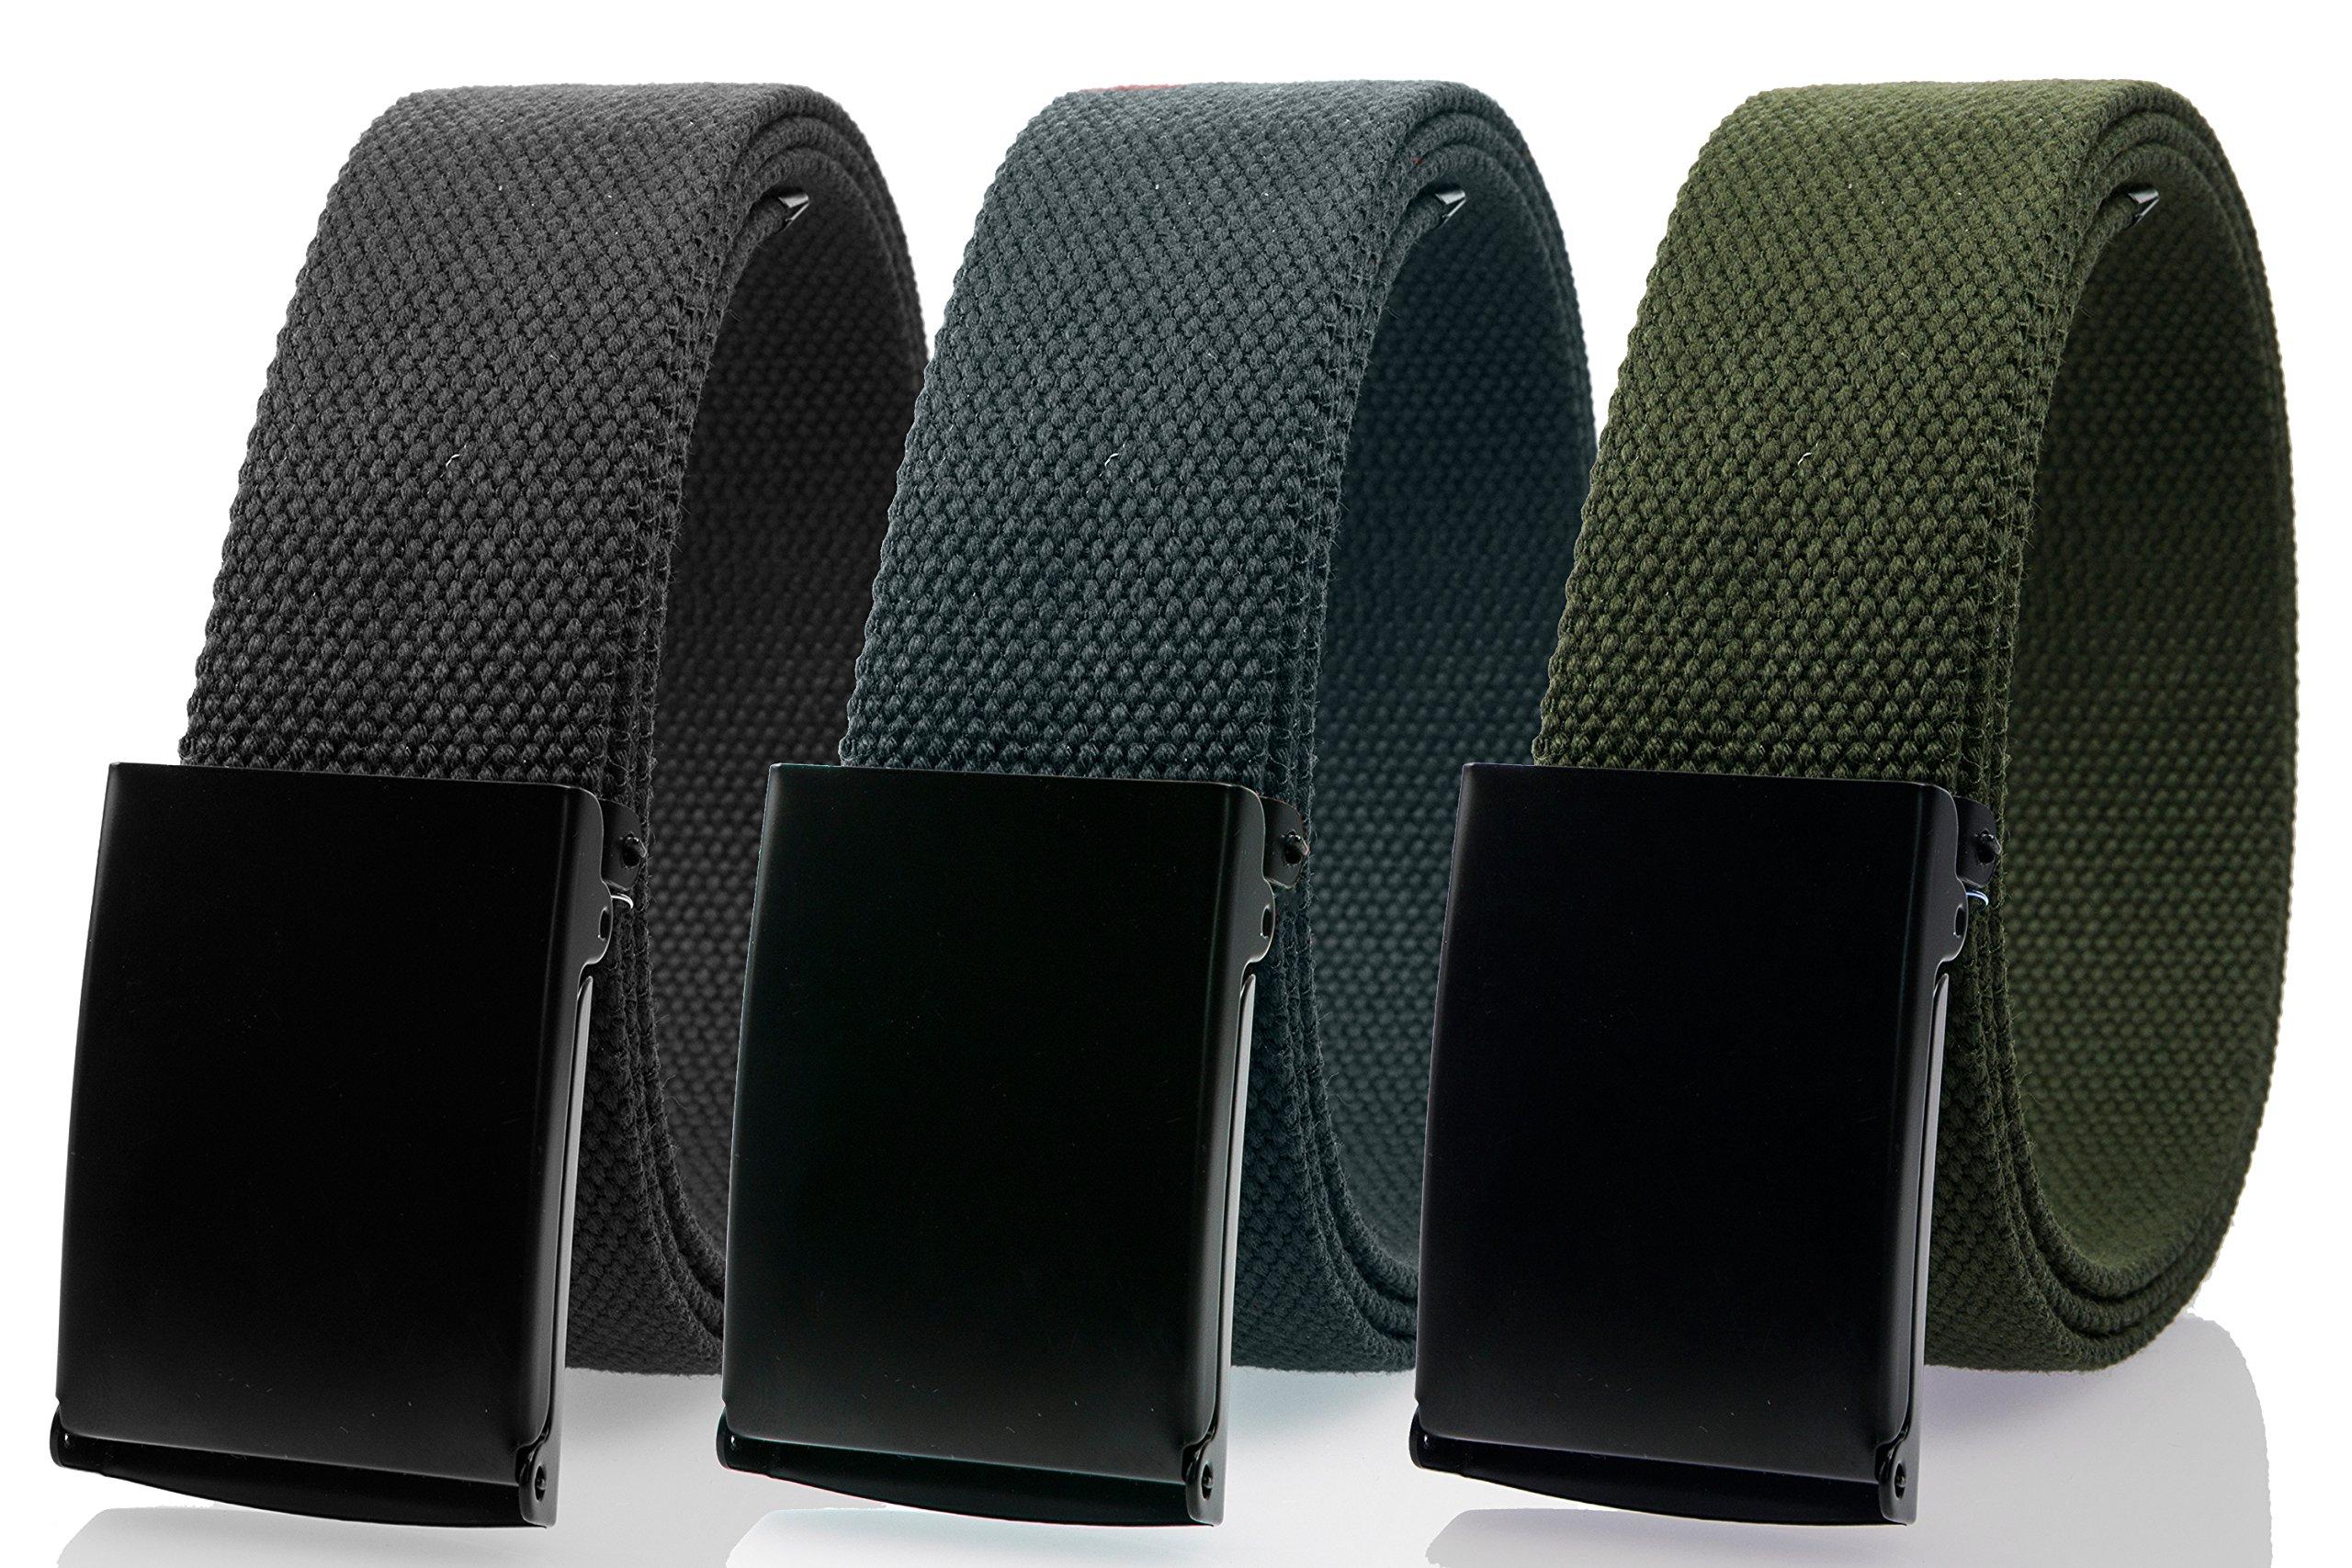 Gelante Fully Adjustable Canvas Web Belt with Black Flip Top Buckle 50'' Long (3 Pack: Black, Dark Gray, Olive)